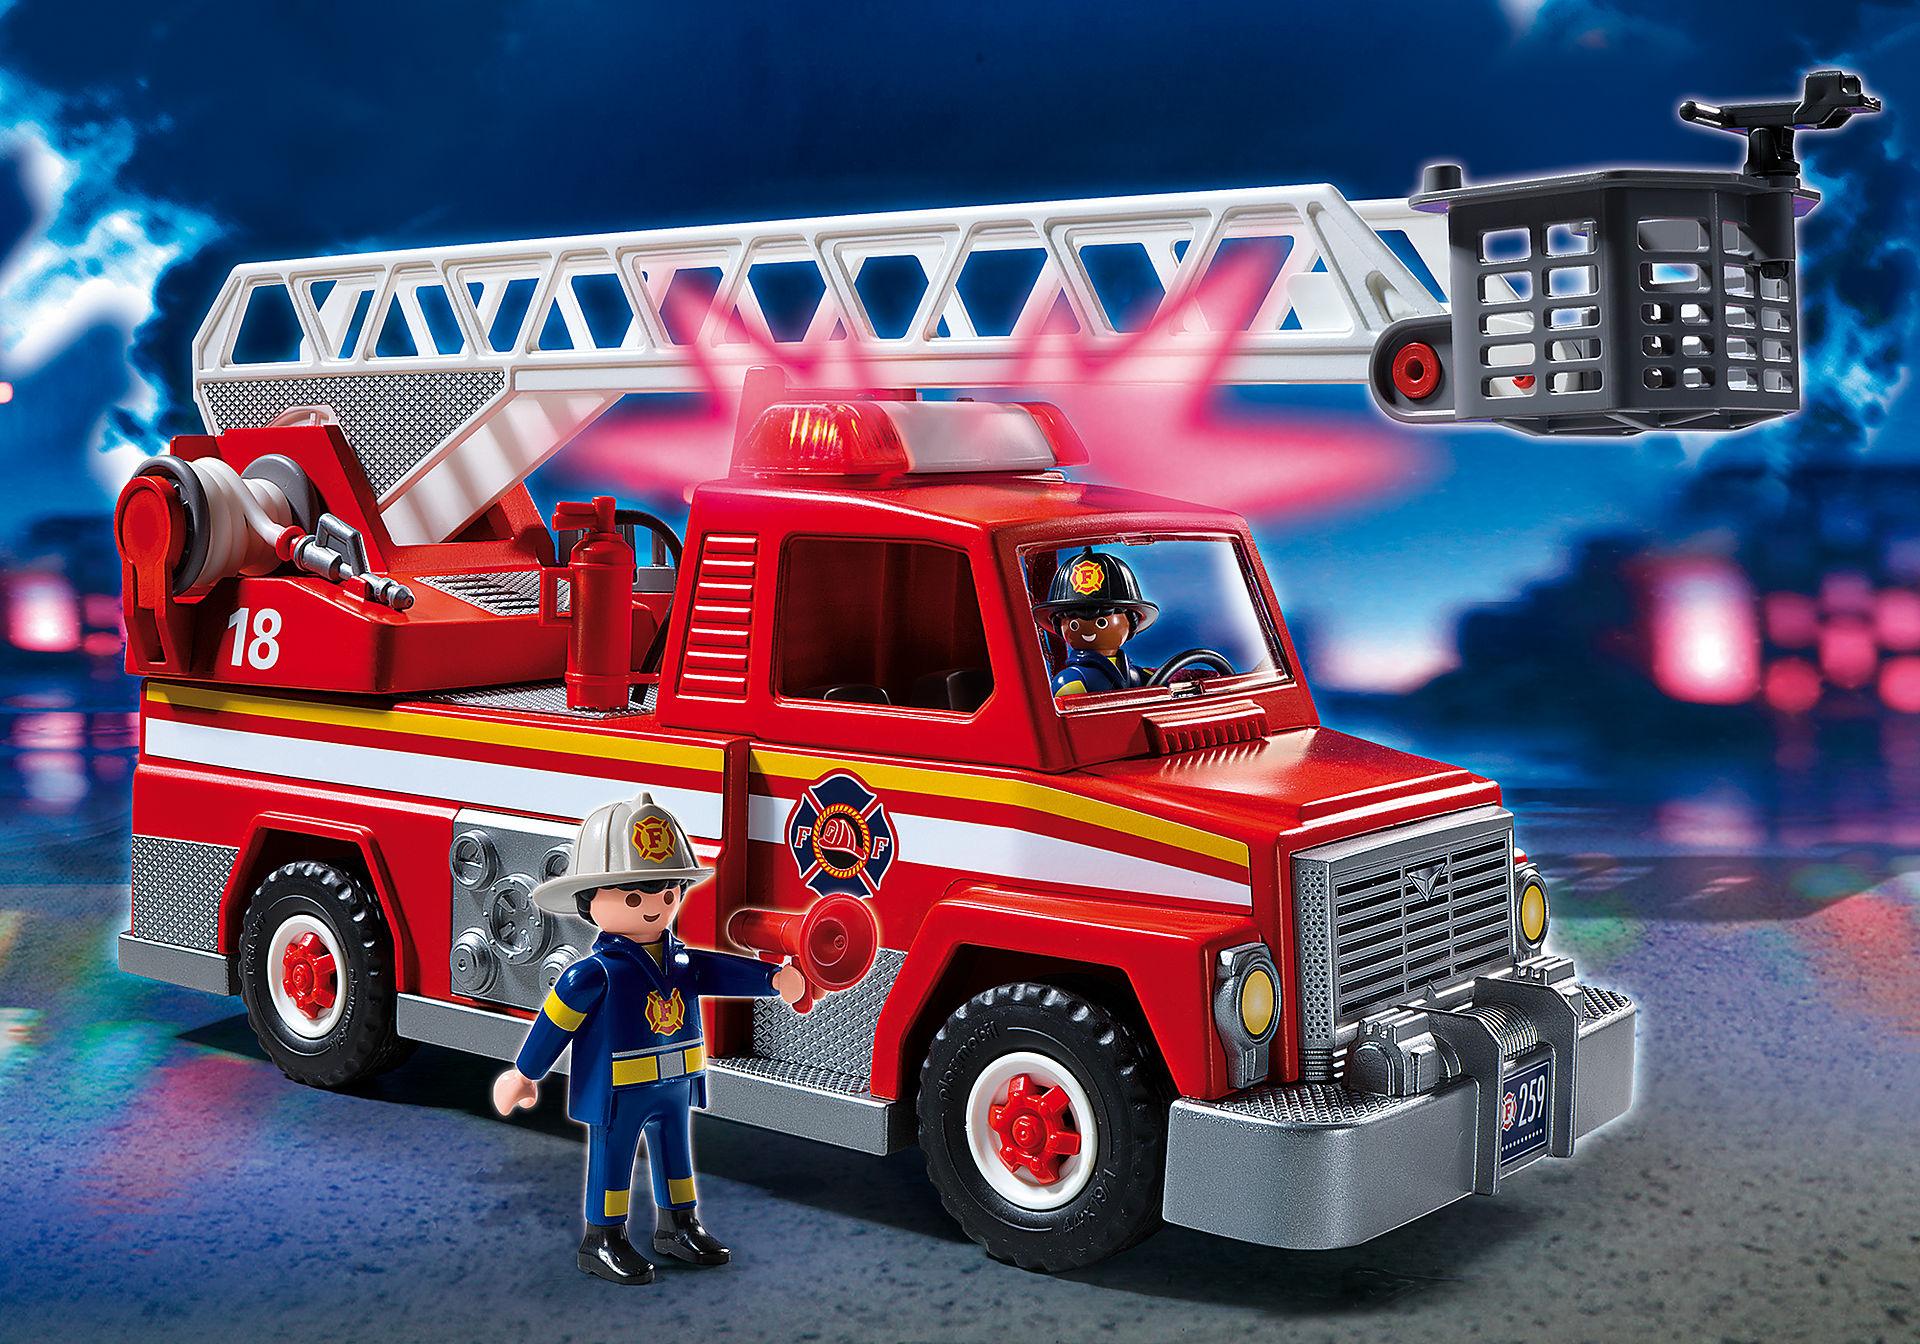 5682 Rescue Ladder Unit zoom image1